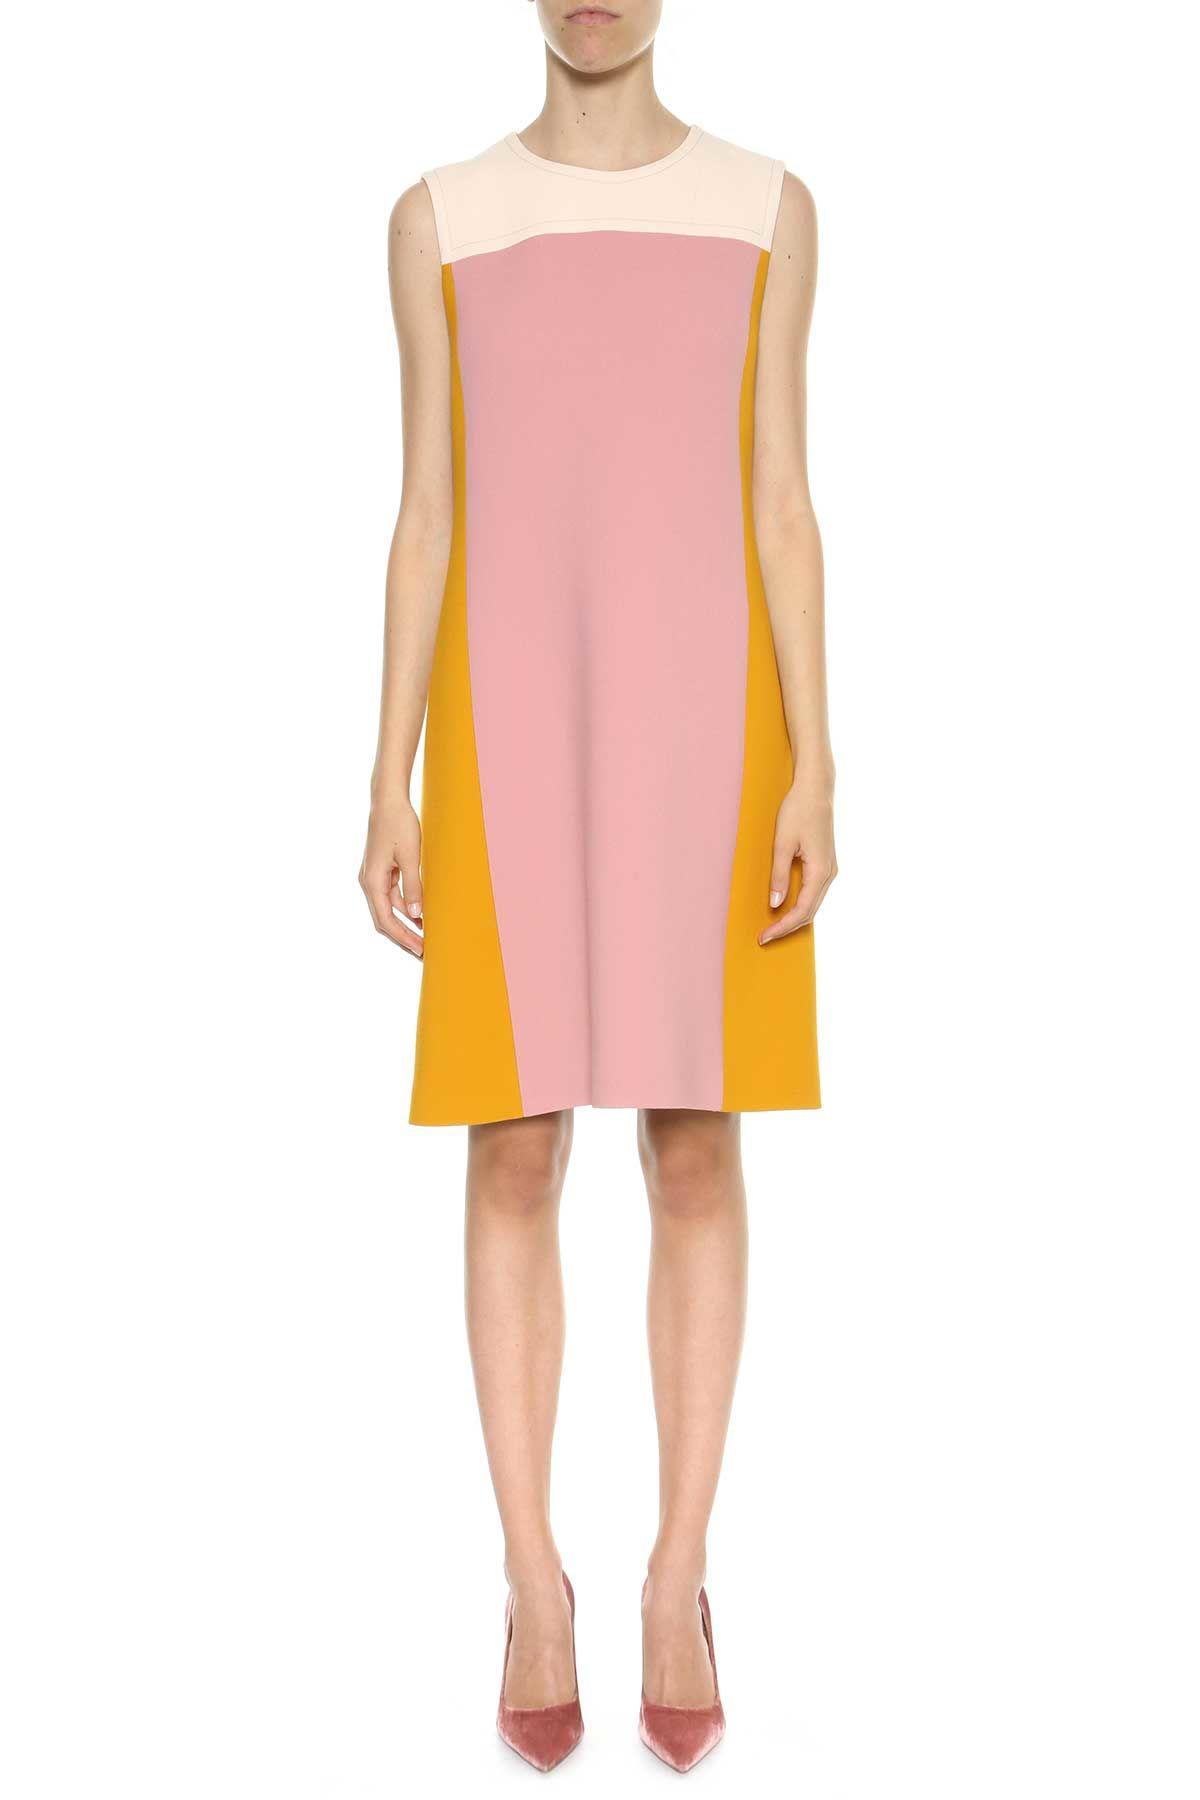 Bottega Veneta Color Block Wool Nattè Dress